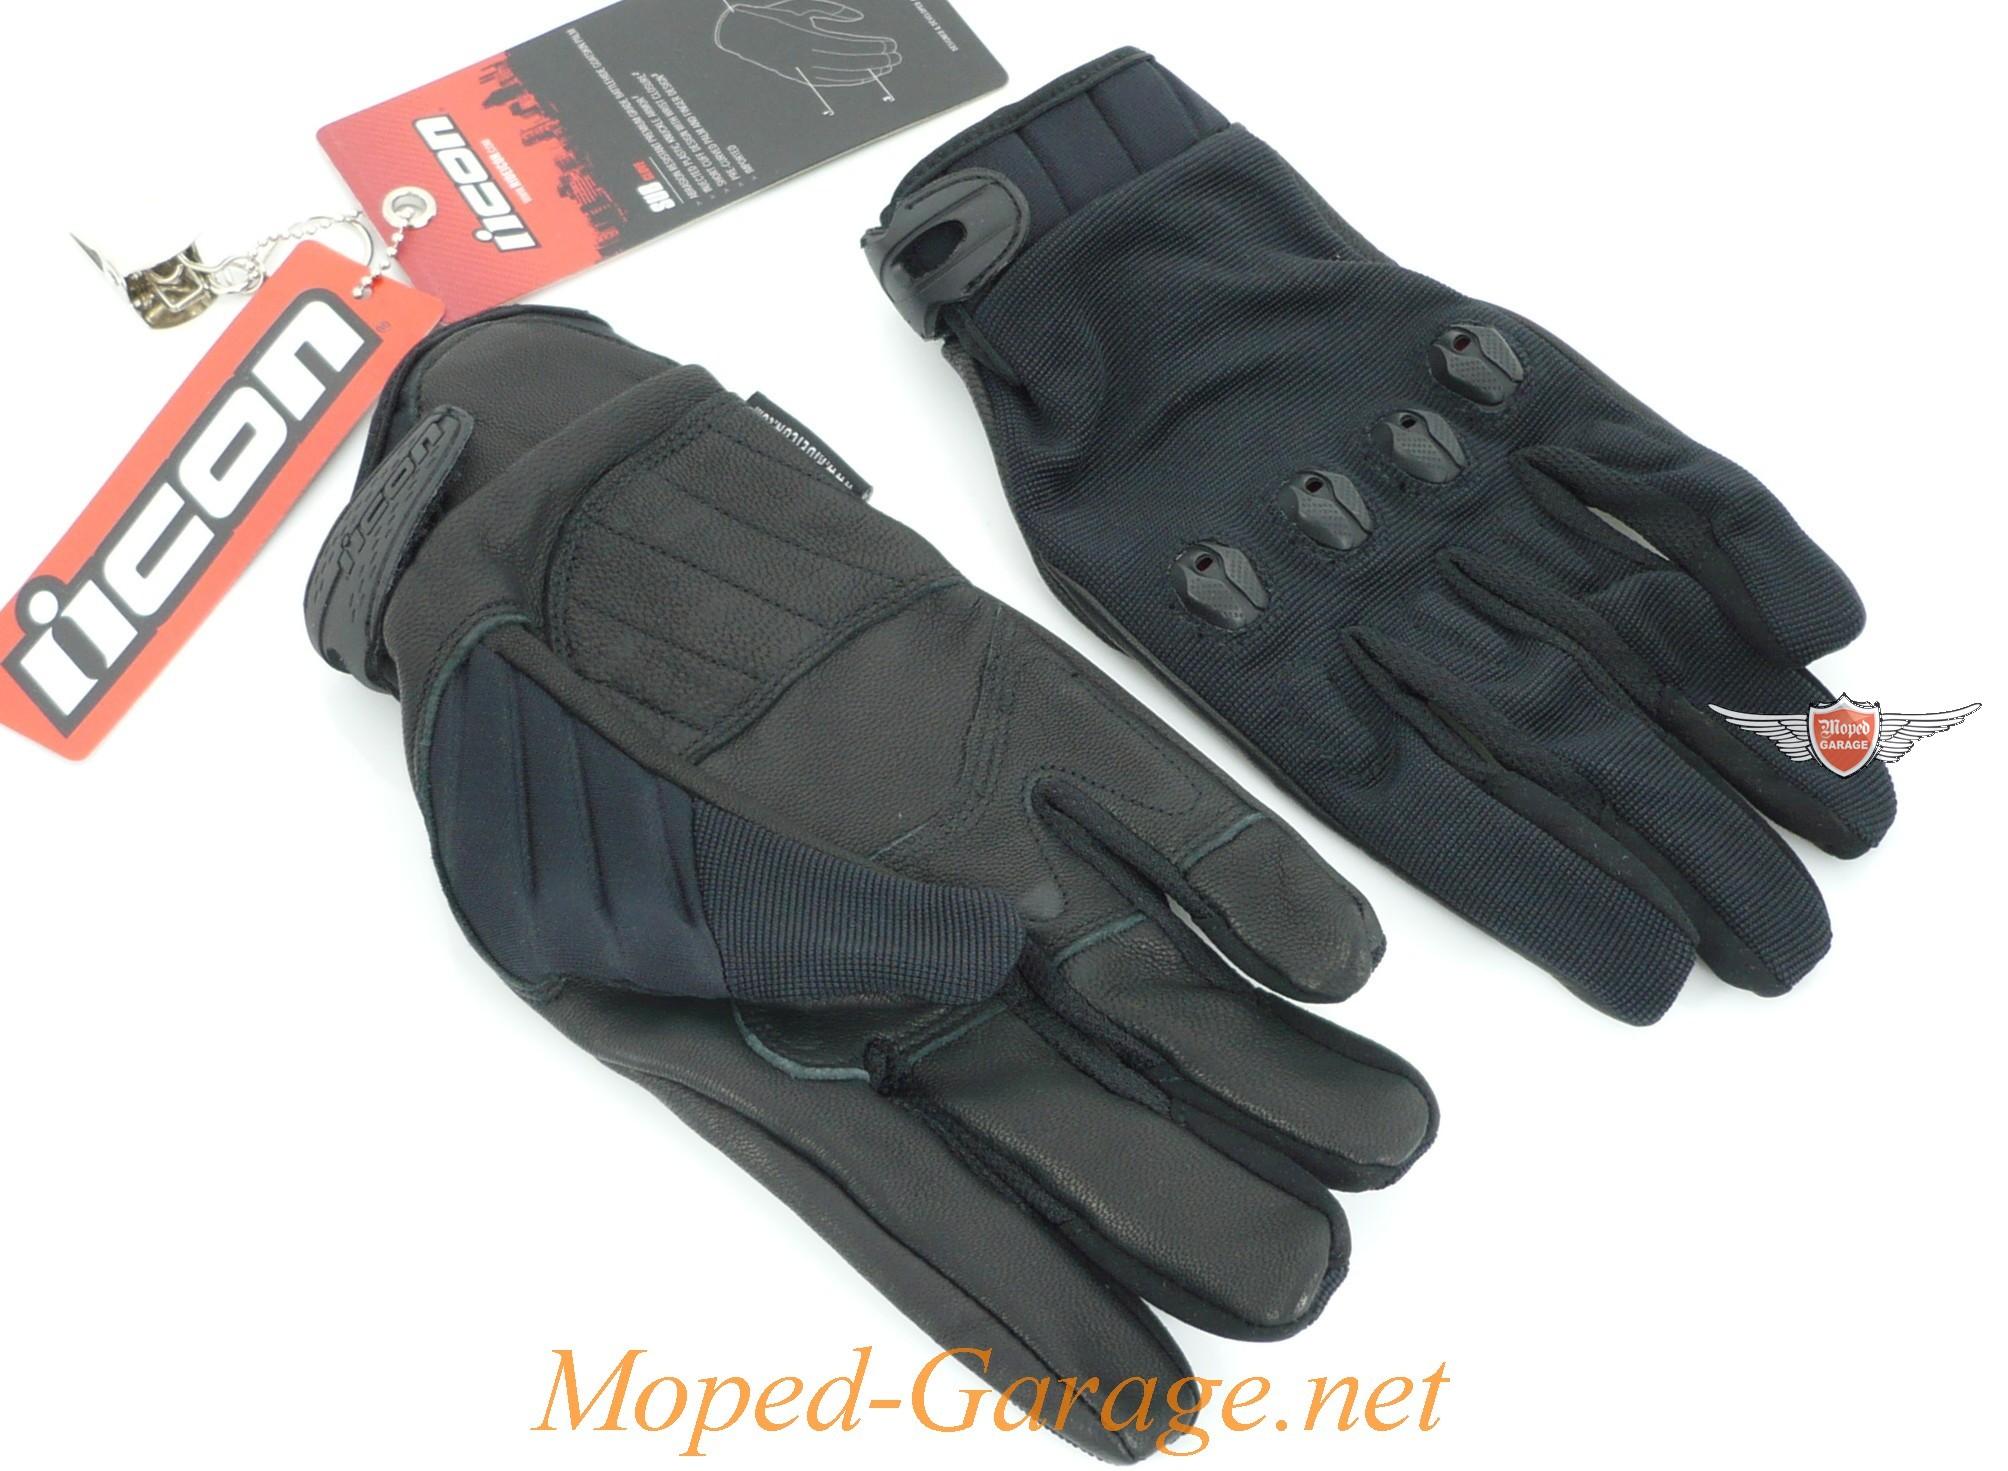 moped motorrad chopper handschuhe icon black. Black Bedroom Furniture Sets. Home Design Ideas